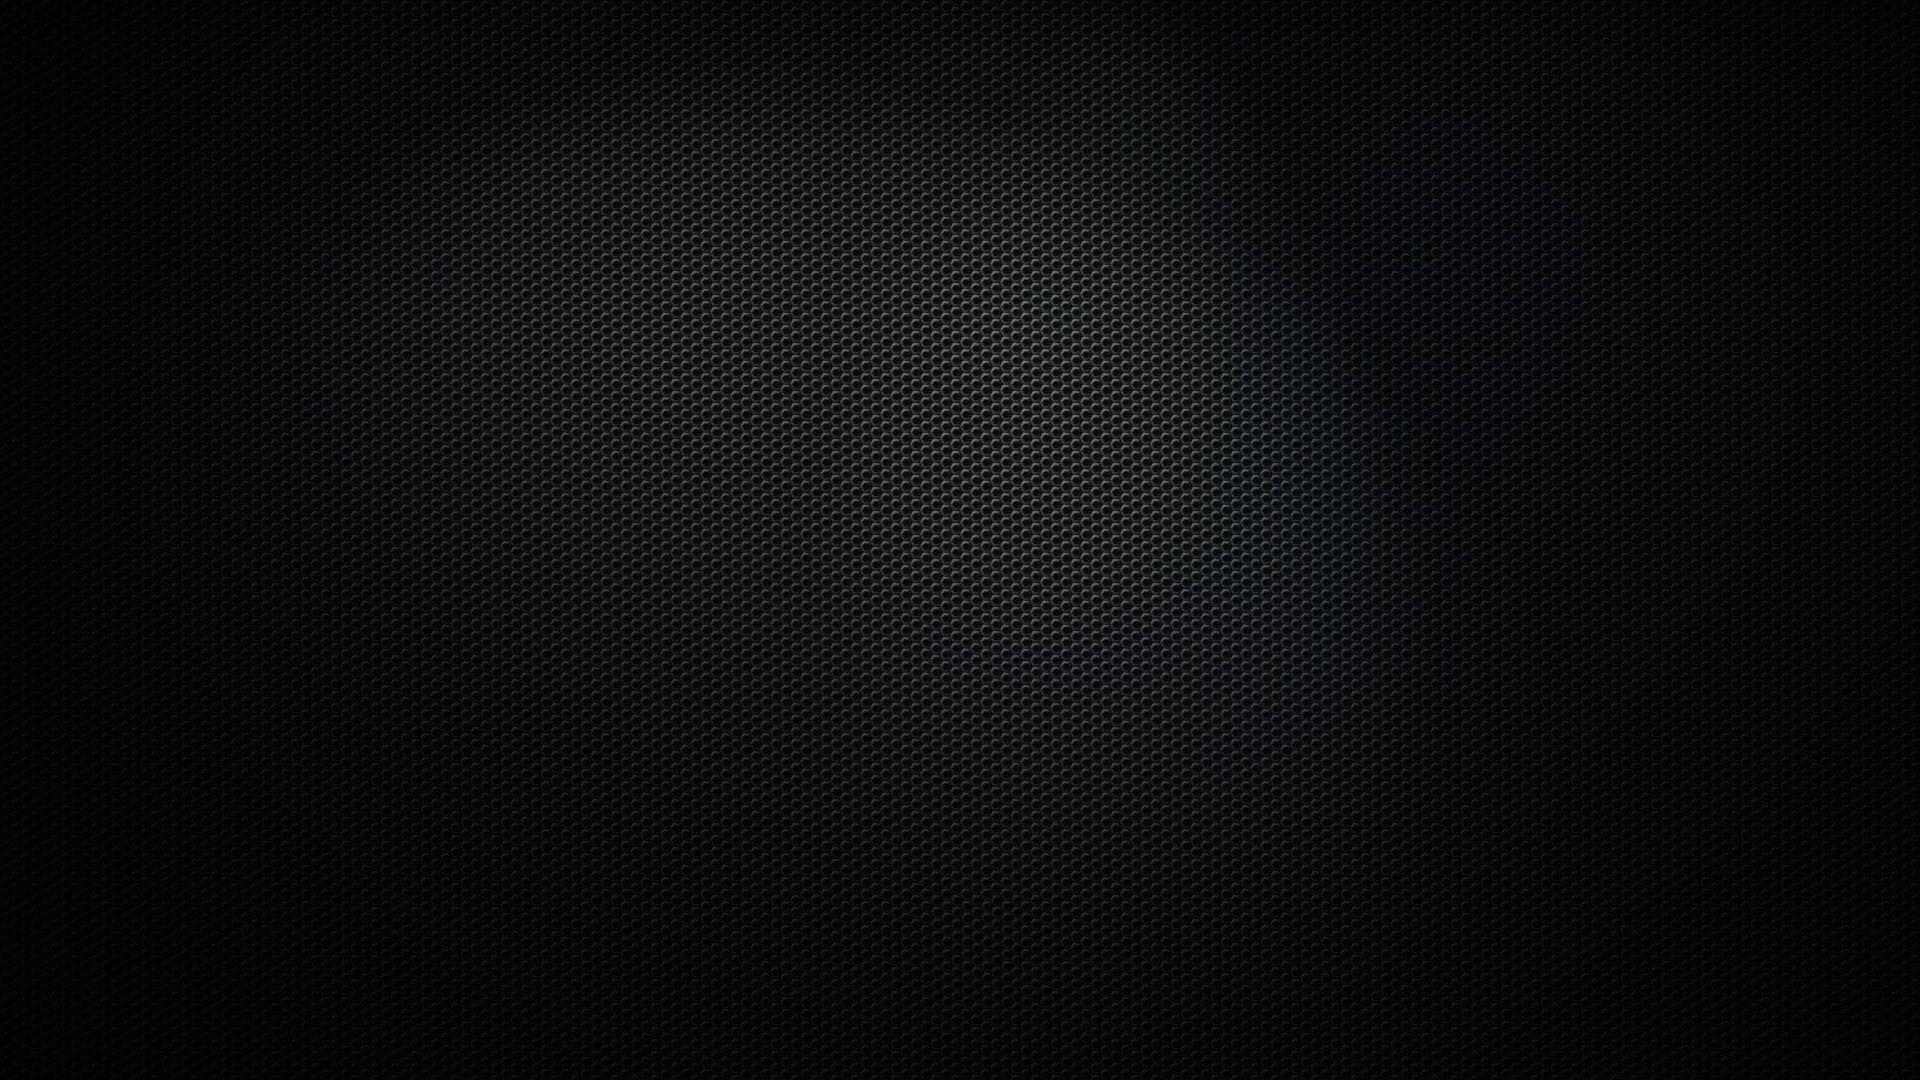 black background 1920x1200 - photo #4